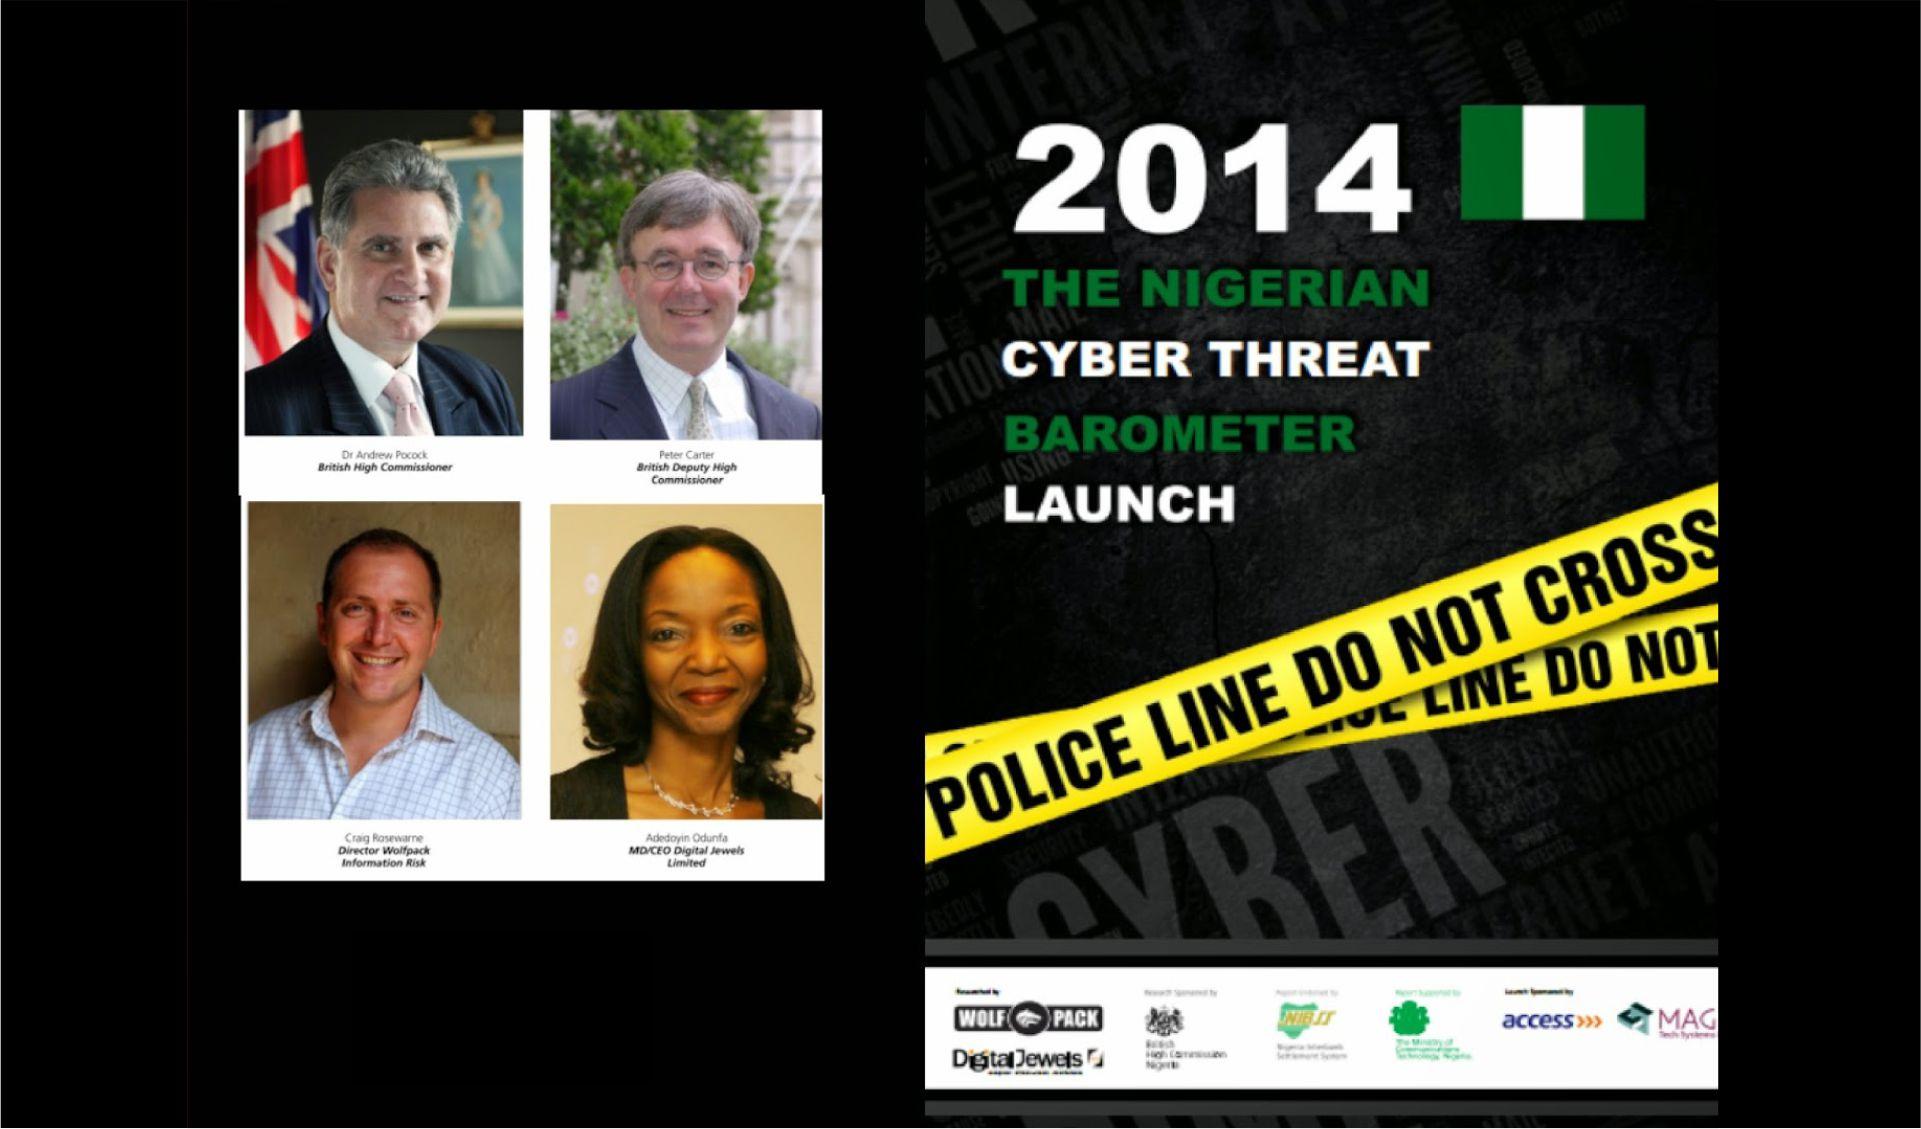 THE 2014 NIGERIAN CYBER THREAT BAROMETER